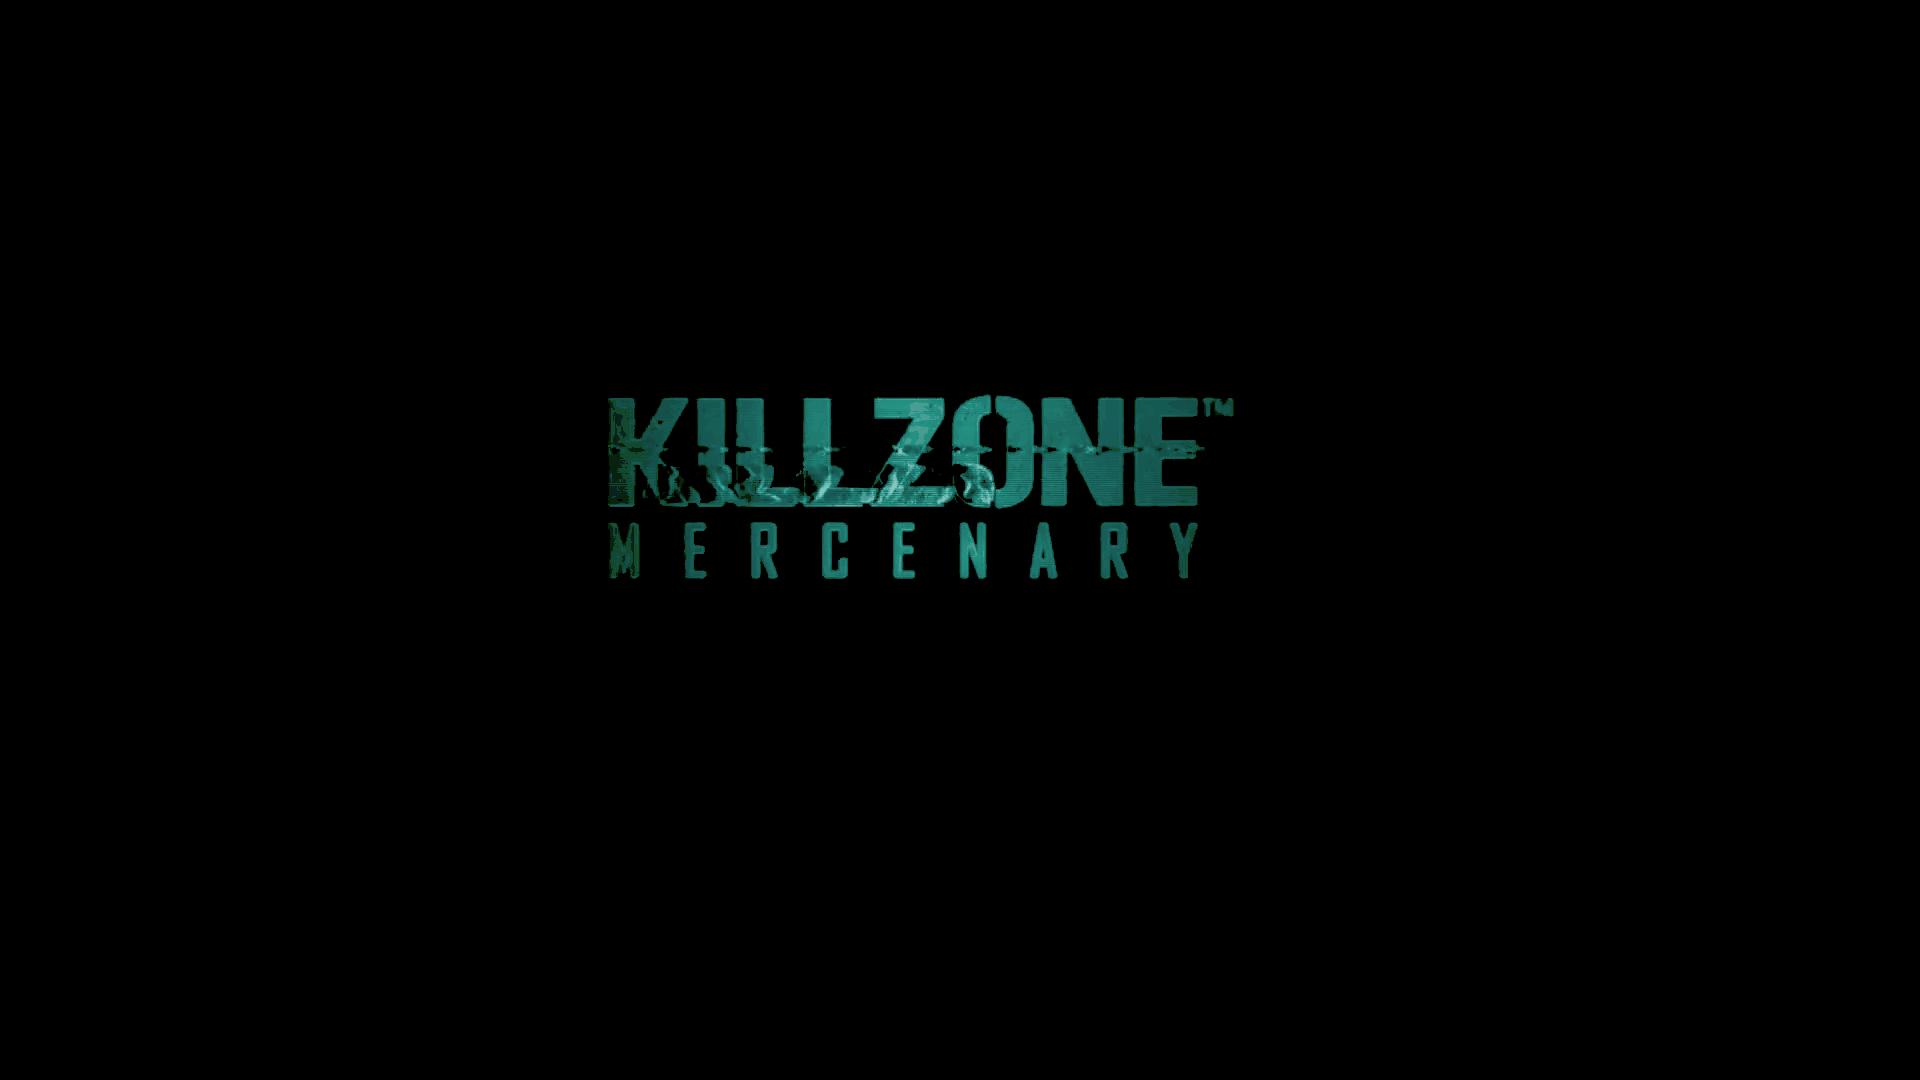 killzone mercenary wallpaper 1 by thebandshee on deviantart